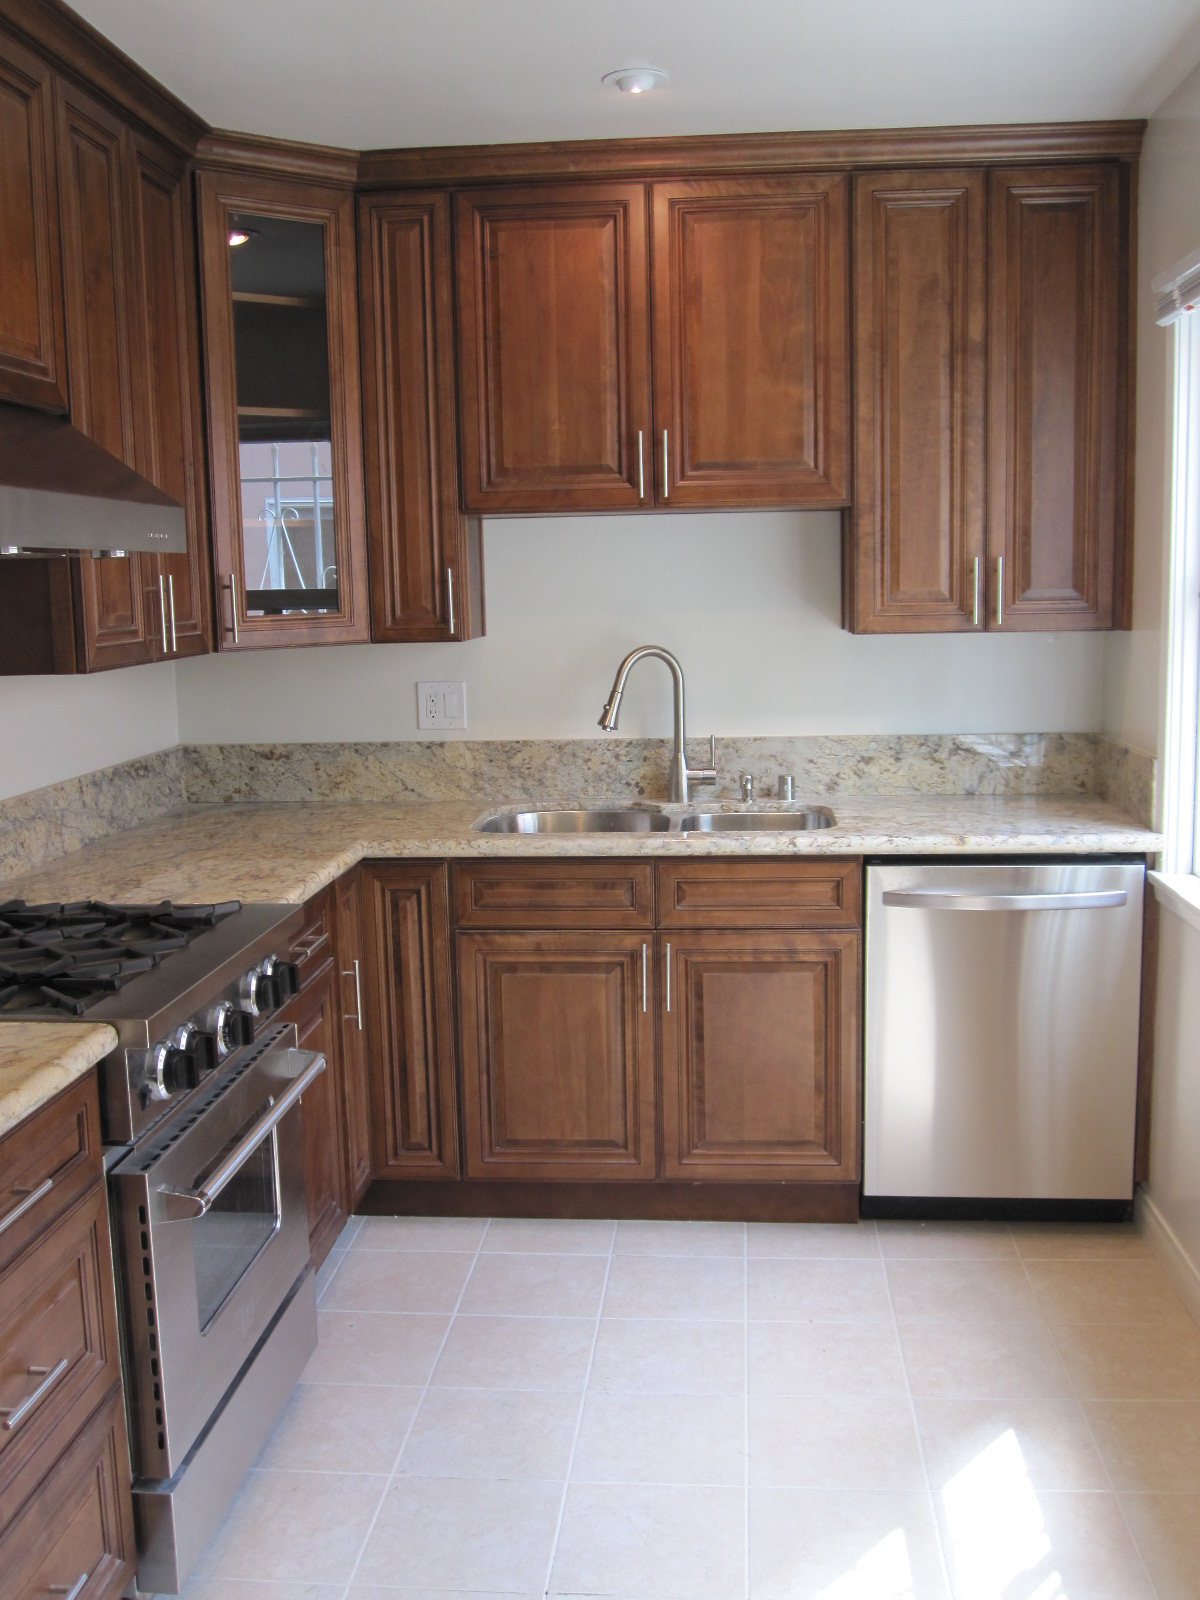 Complete Kitchen Remodel in Pasadena, CA